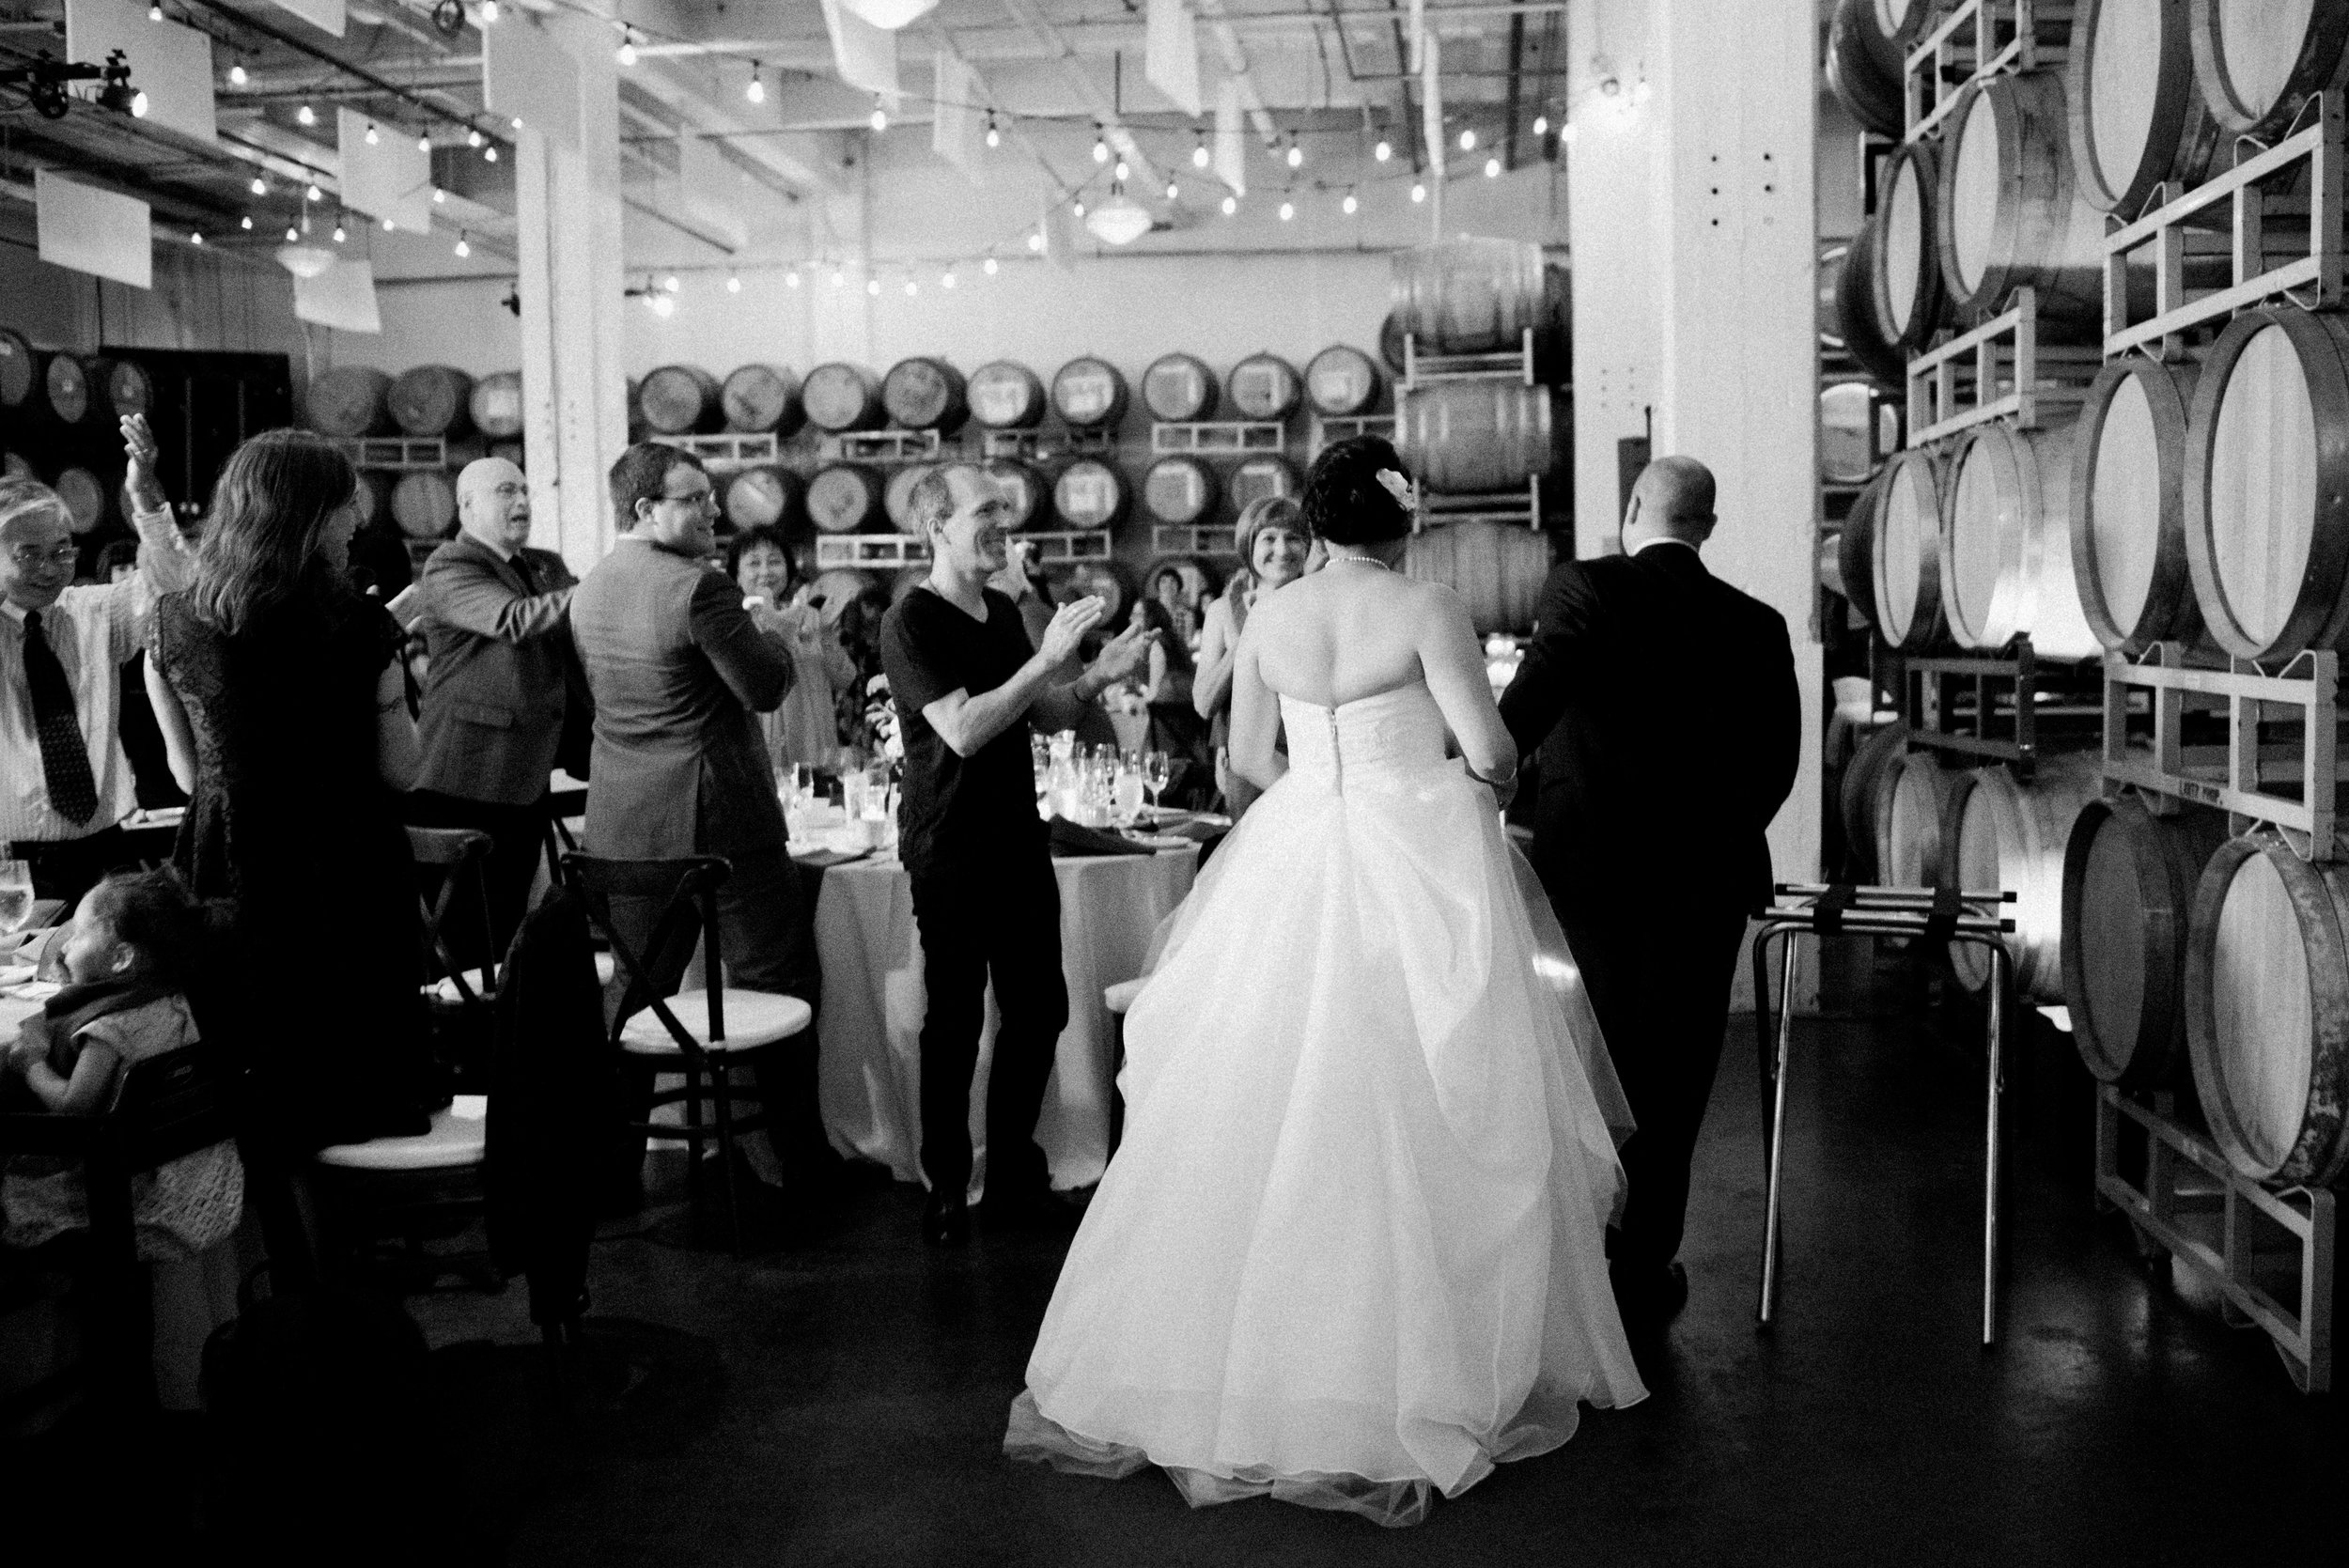 Swedenborgian Church Dogpatch Winery Wedding065.jpg